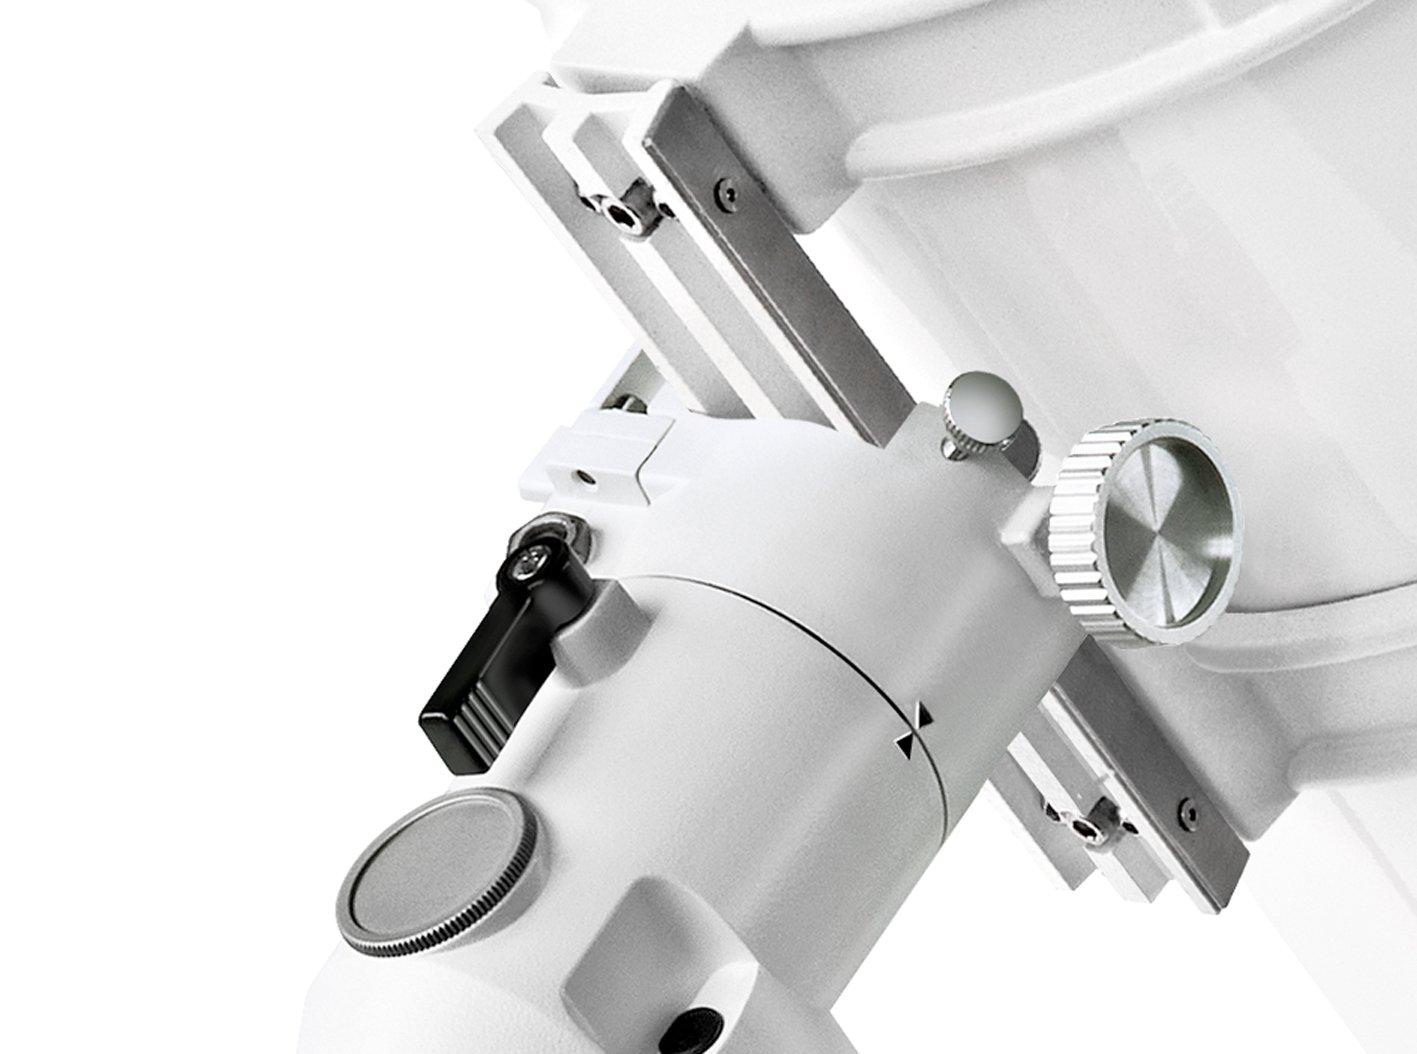 Bresser teleskop messier nt exos amazon